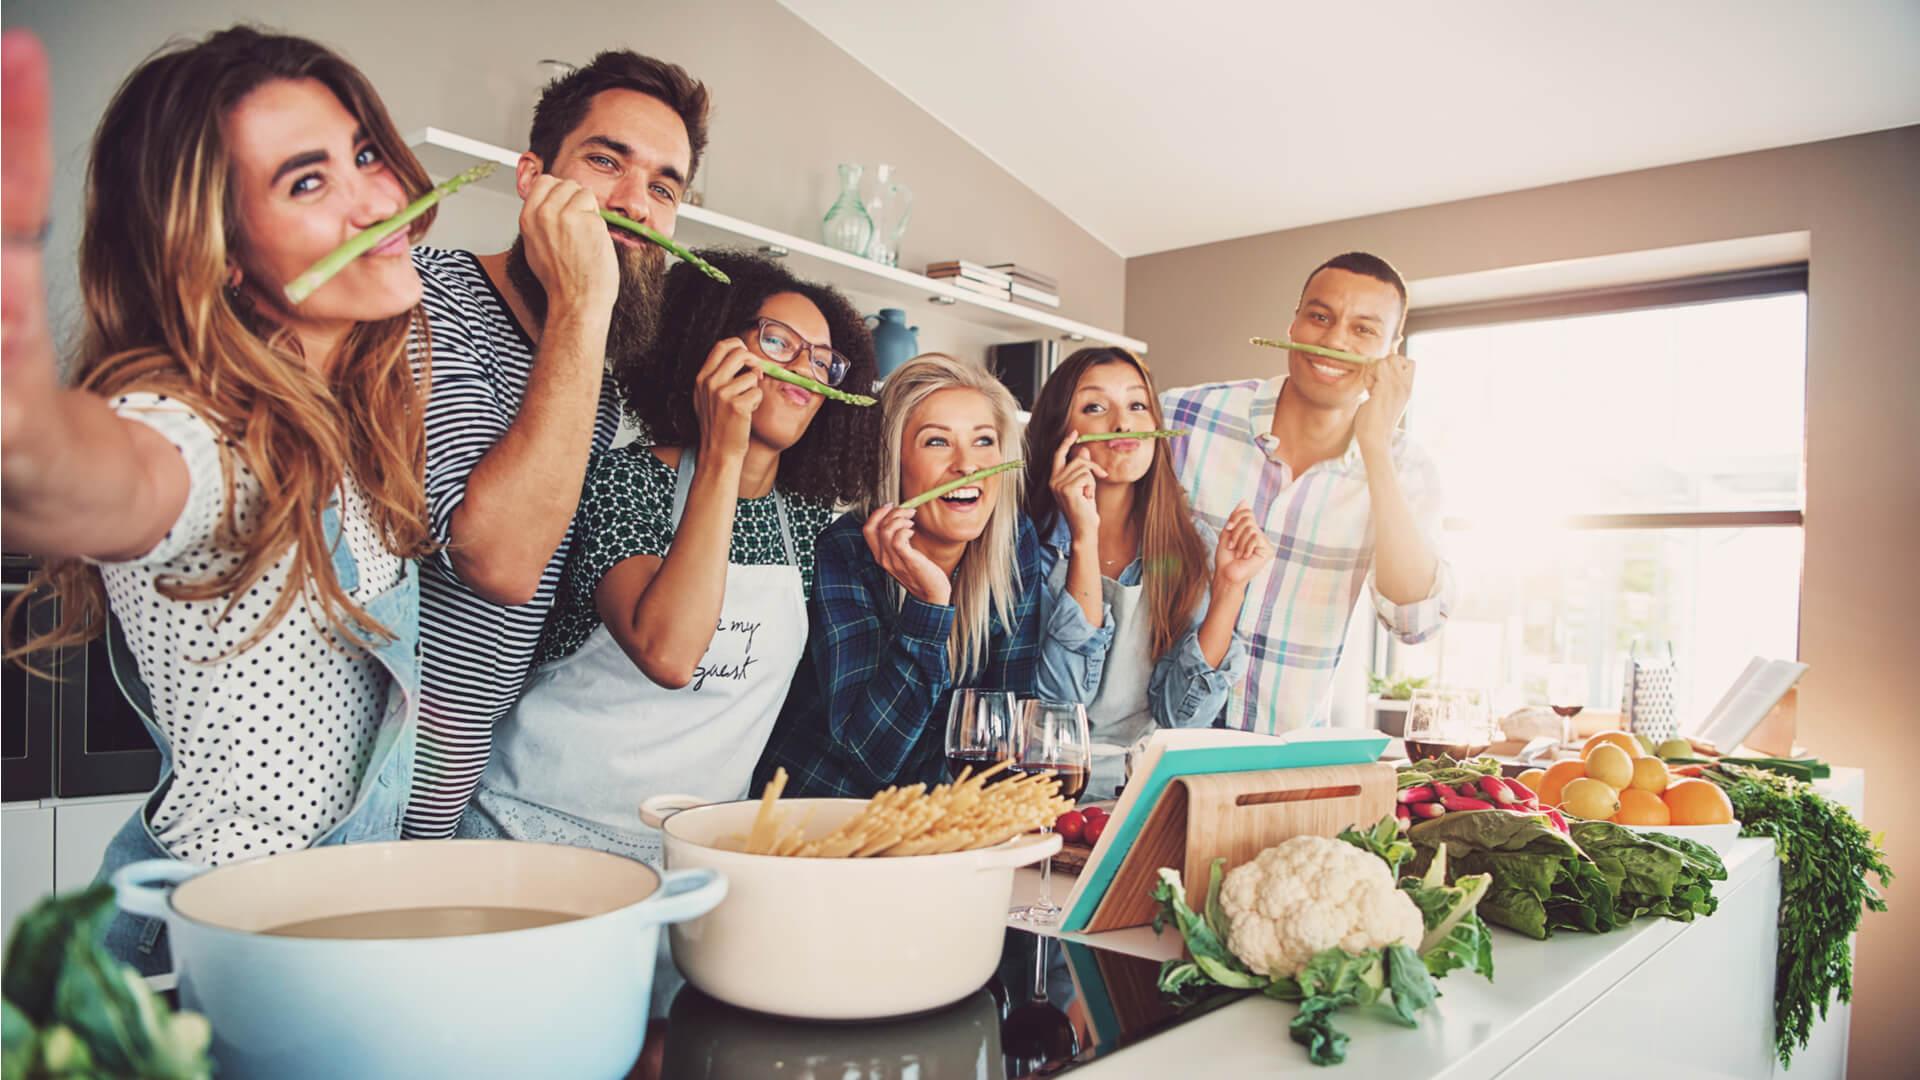 Tot ce trebuie sa stii despre alimentatia sanatoasa